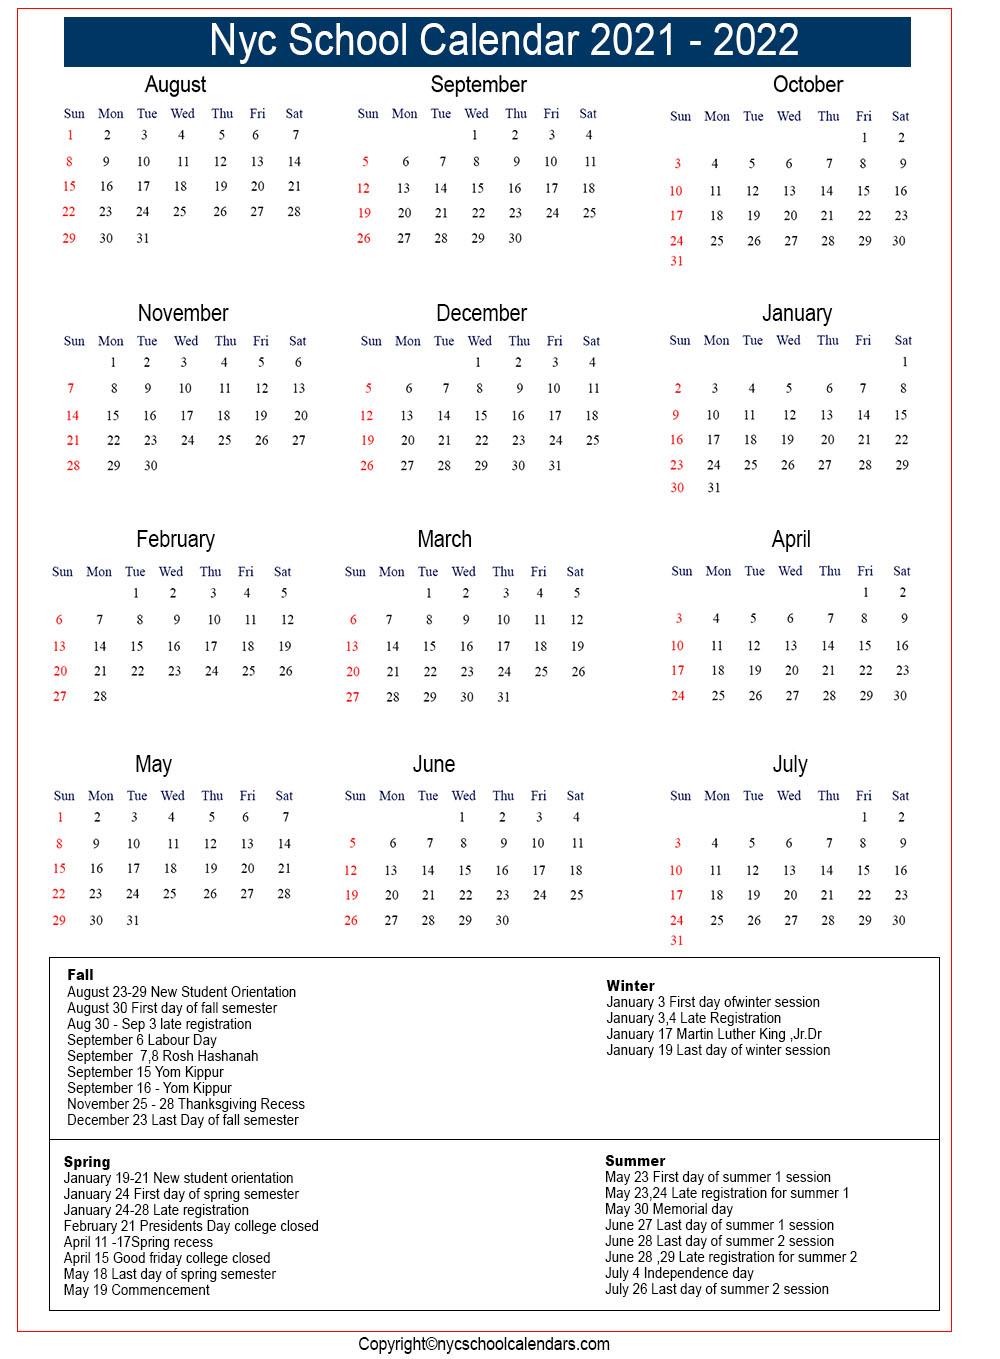 Nyc School Calendar 2021 ✅❤️ For East Meadow School District Calendar